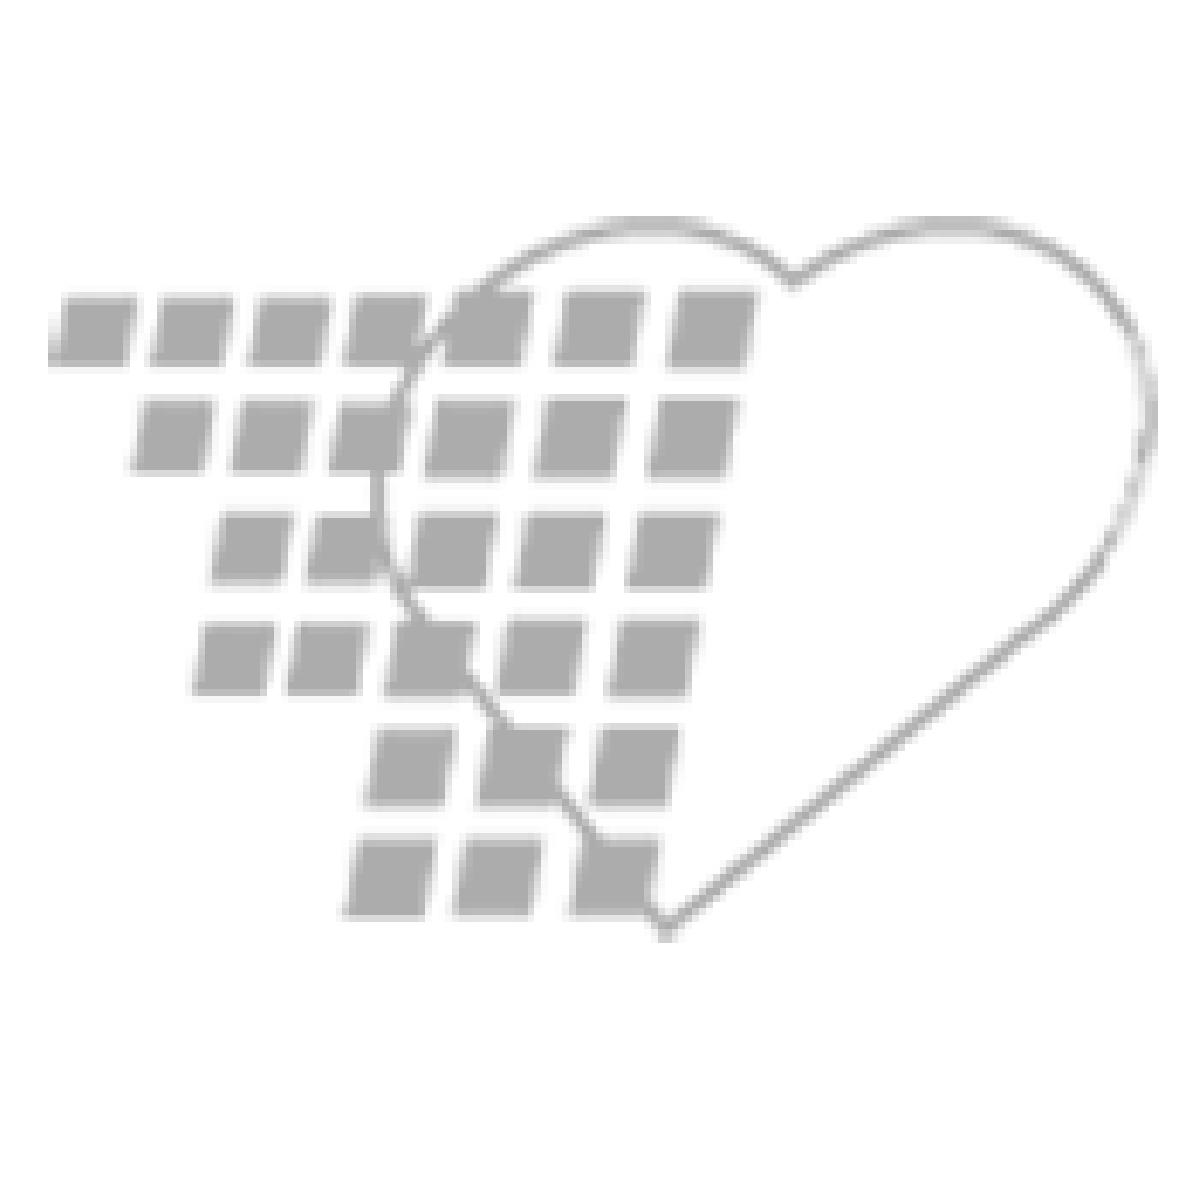 05-87-0102 STATLOCK® Foley Stabilizaton Device